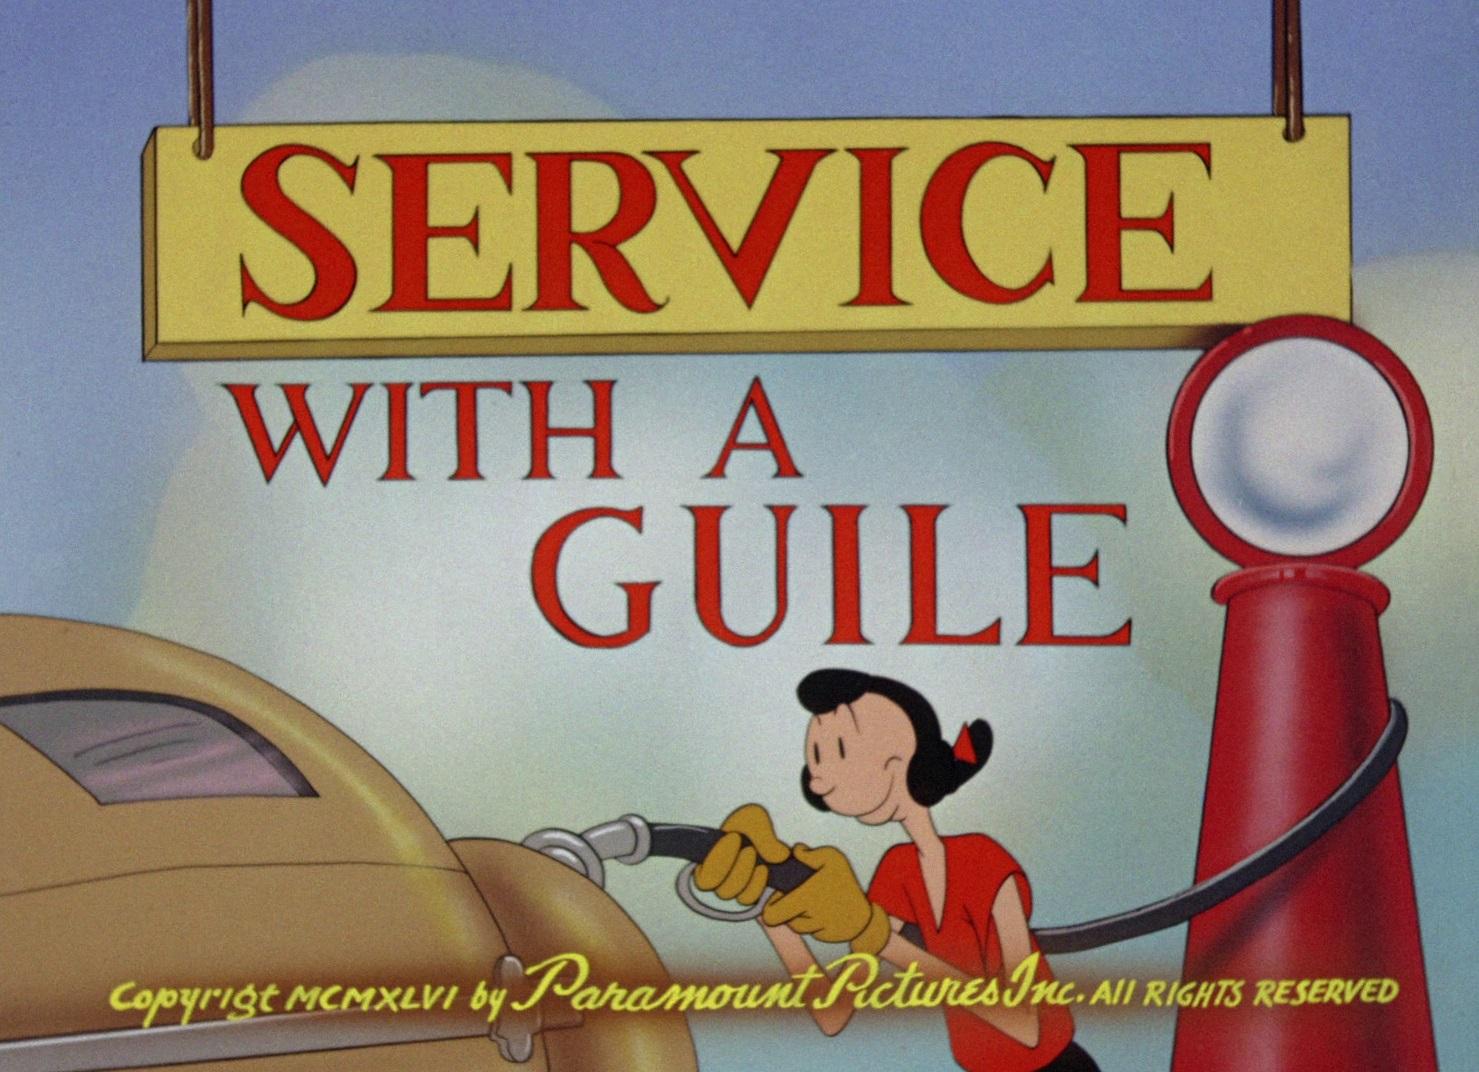 Service guile